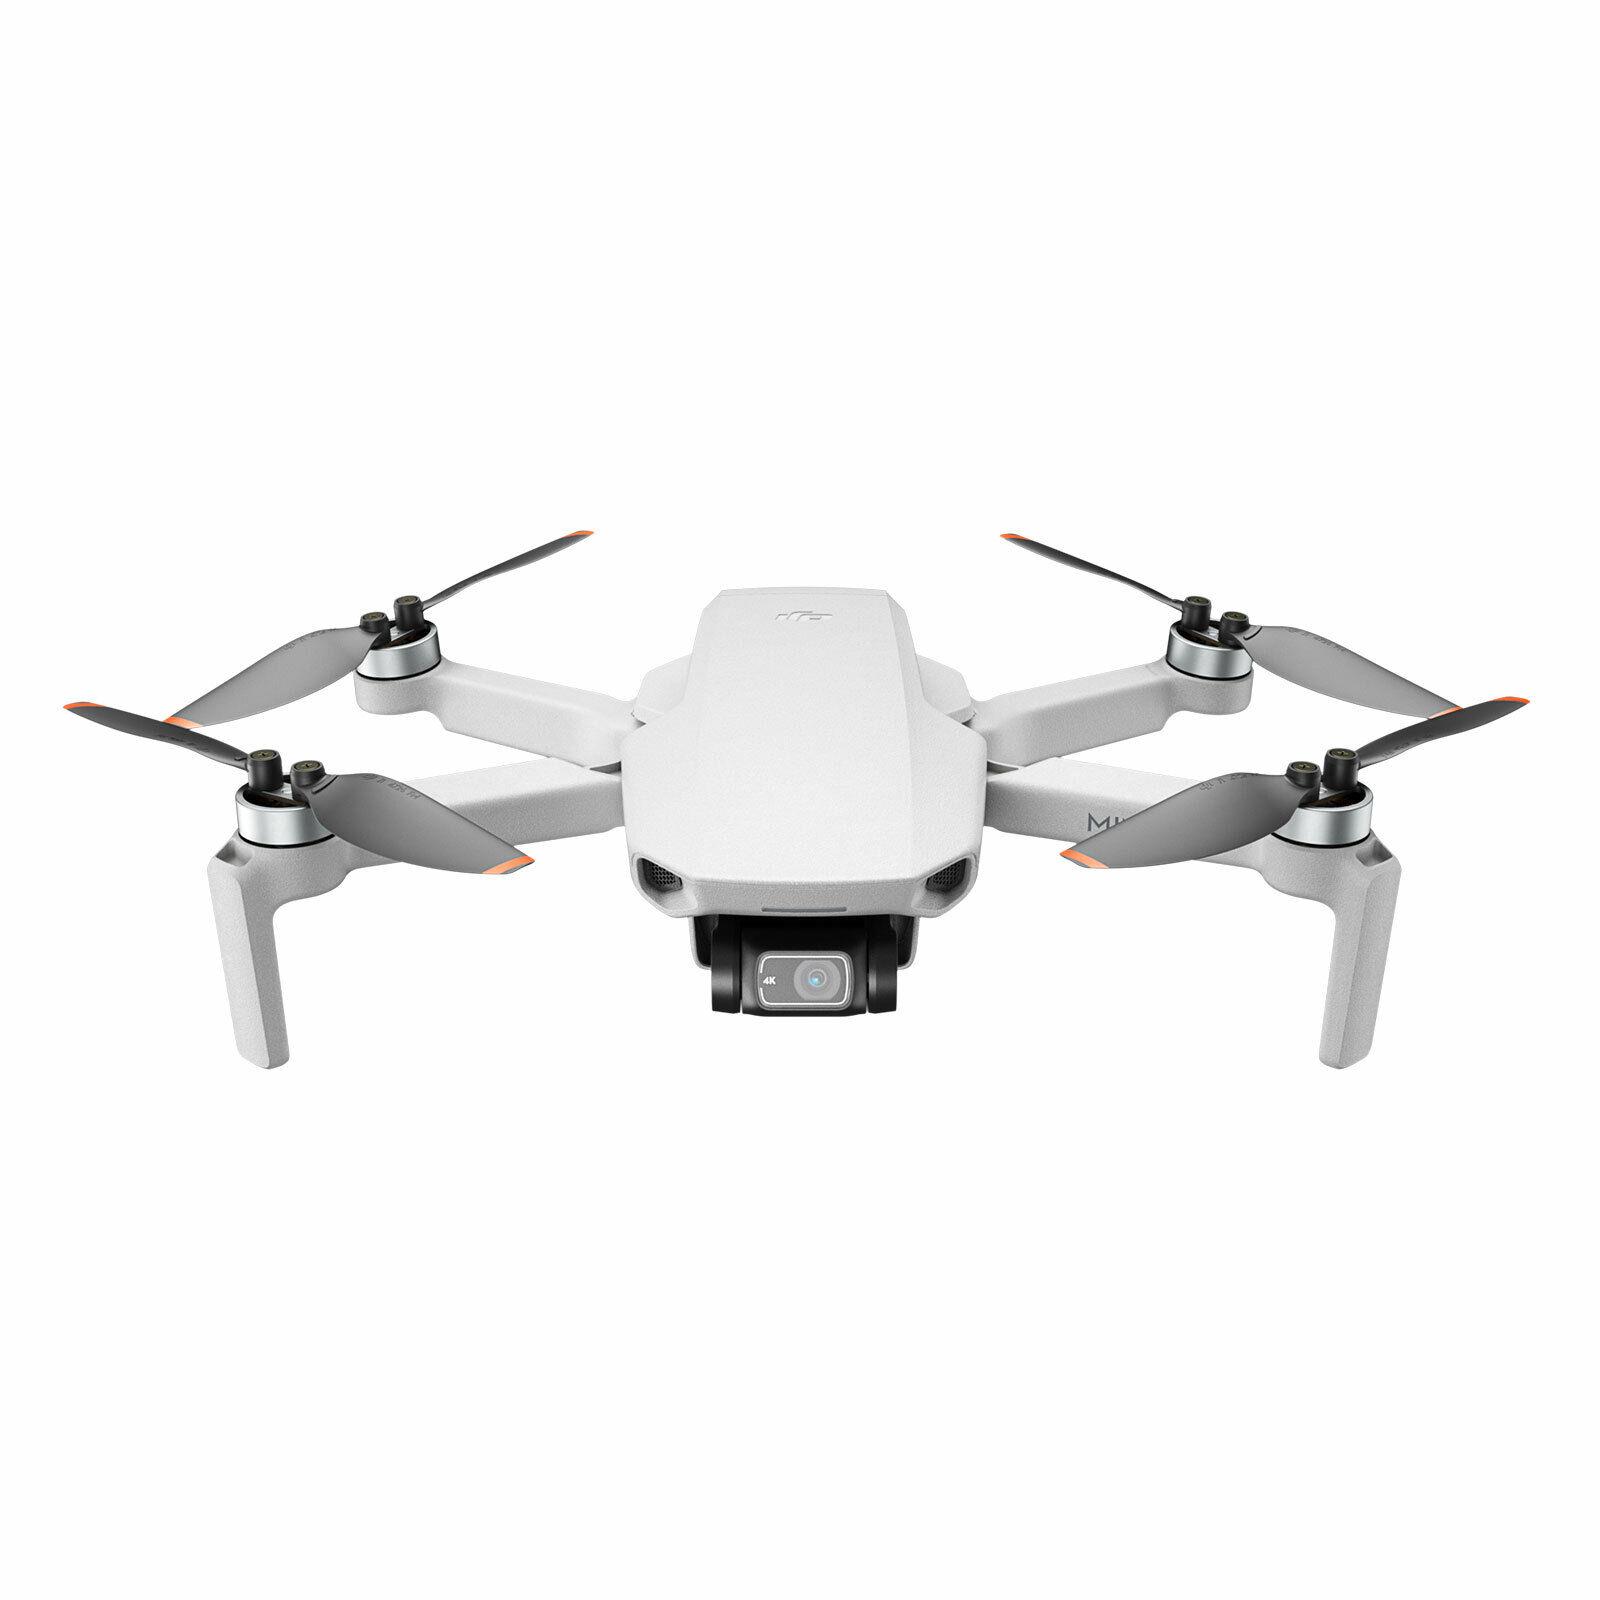 DJI Mini 2 Fly More Combo Kameradrohne 4K Quadrocopter Drone Multicopter Leicht